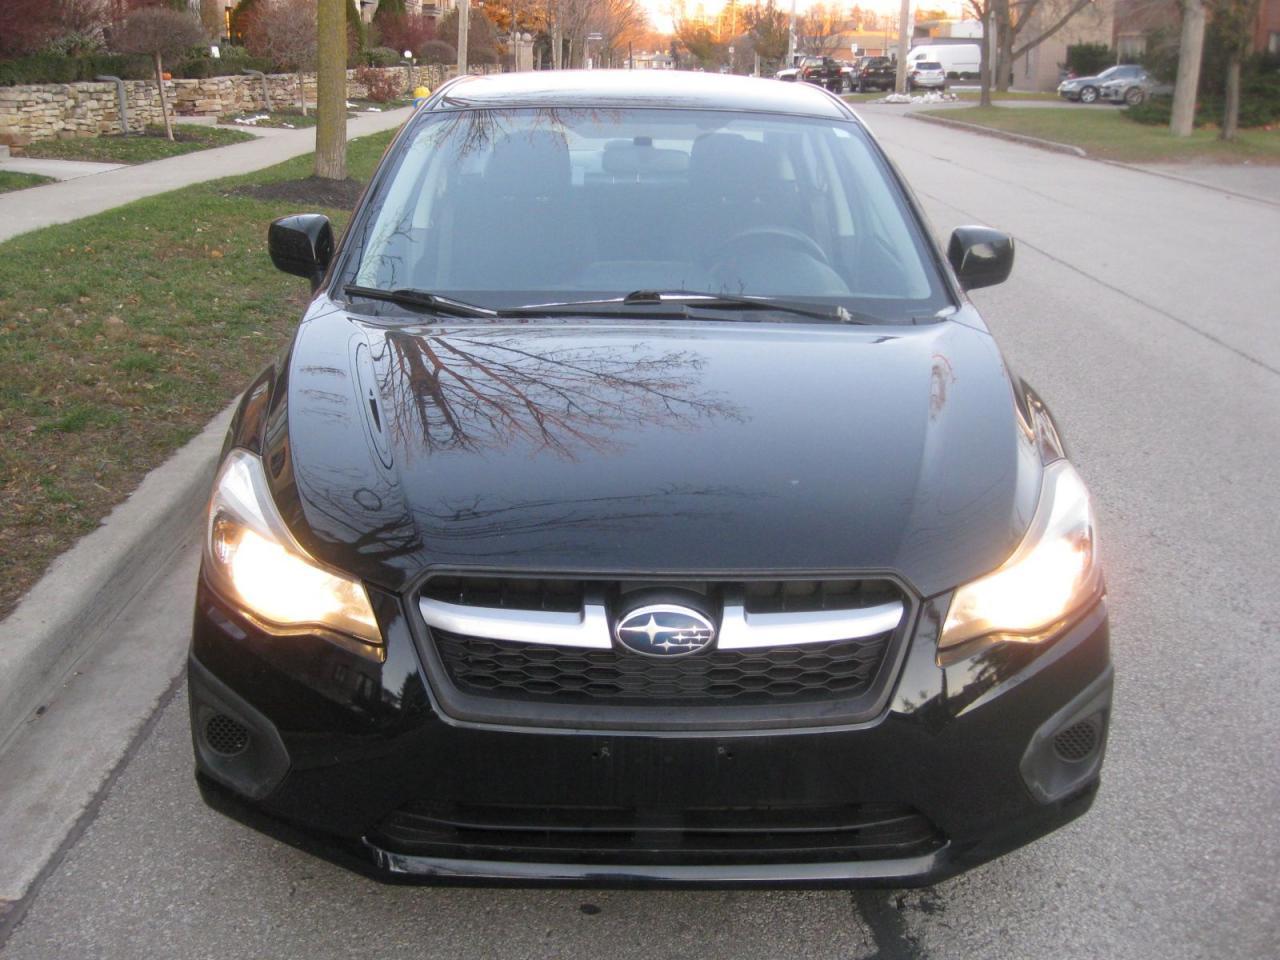 2012 Subaru Impreza AWD, 5SP MANUAL, NO ACCIDENTS, CERTIFIED, A1